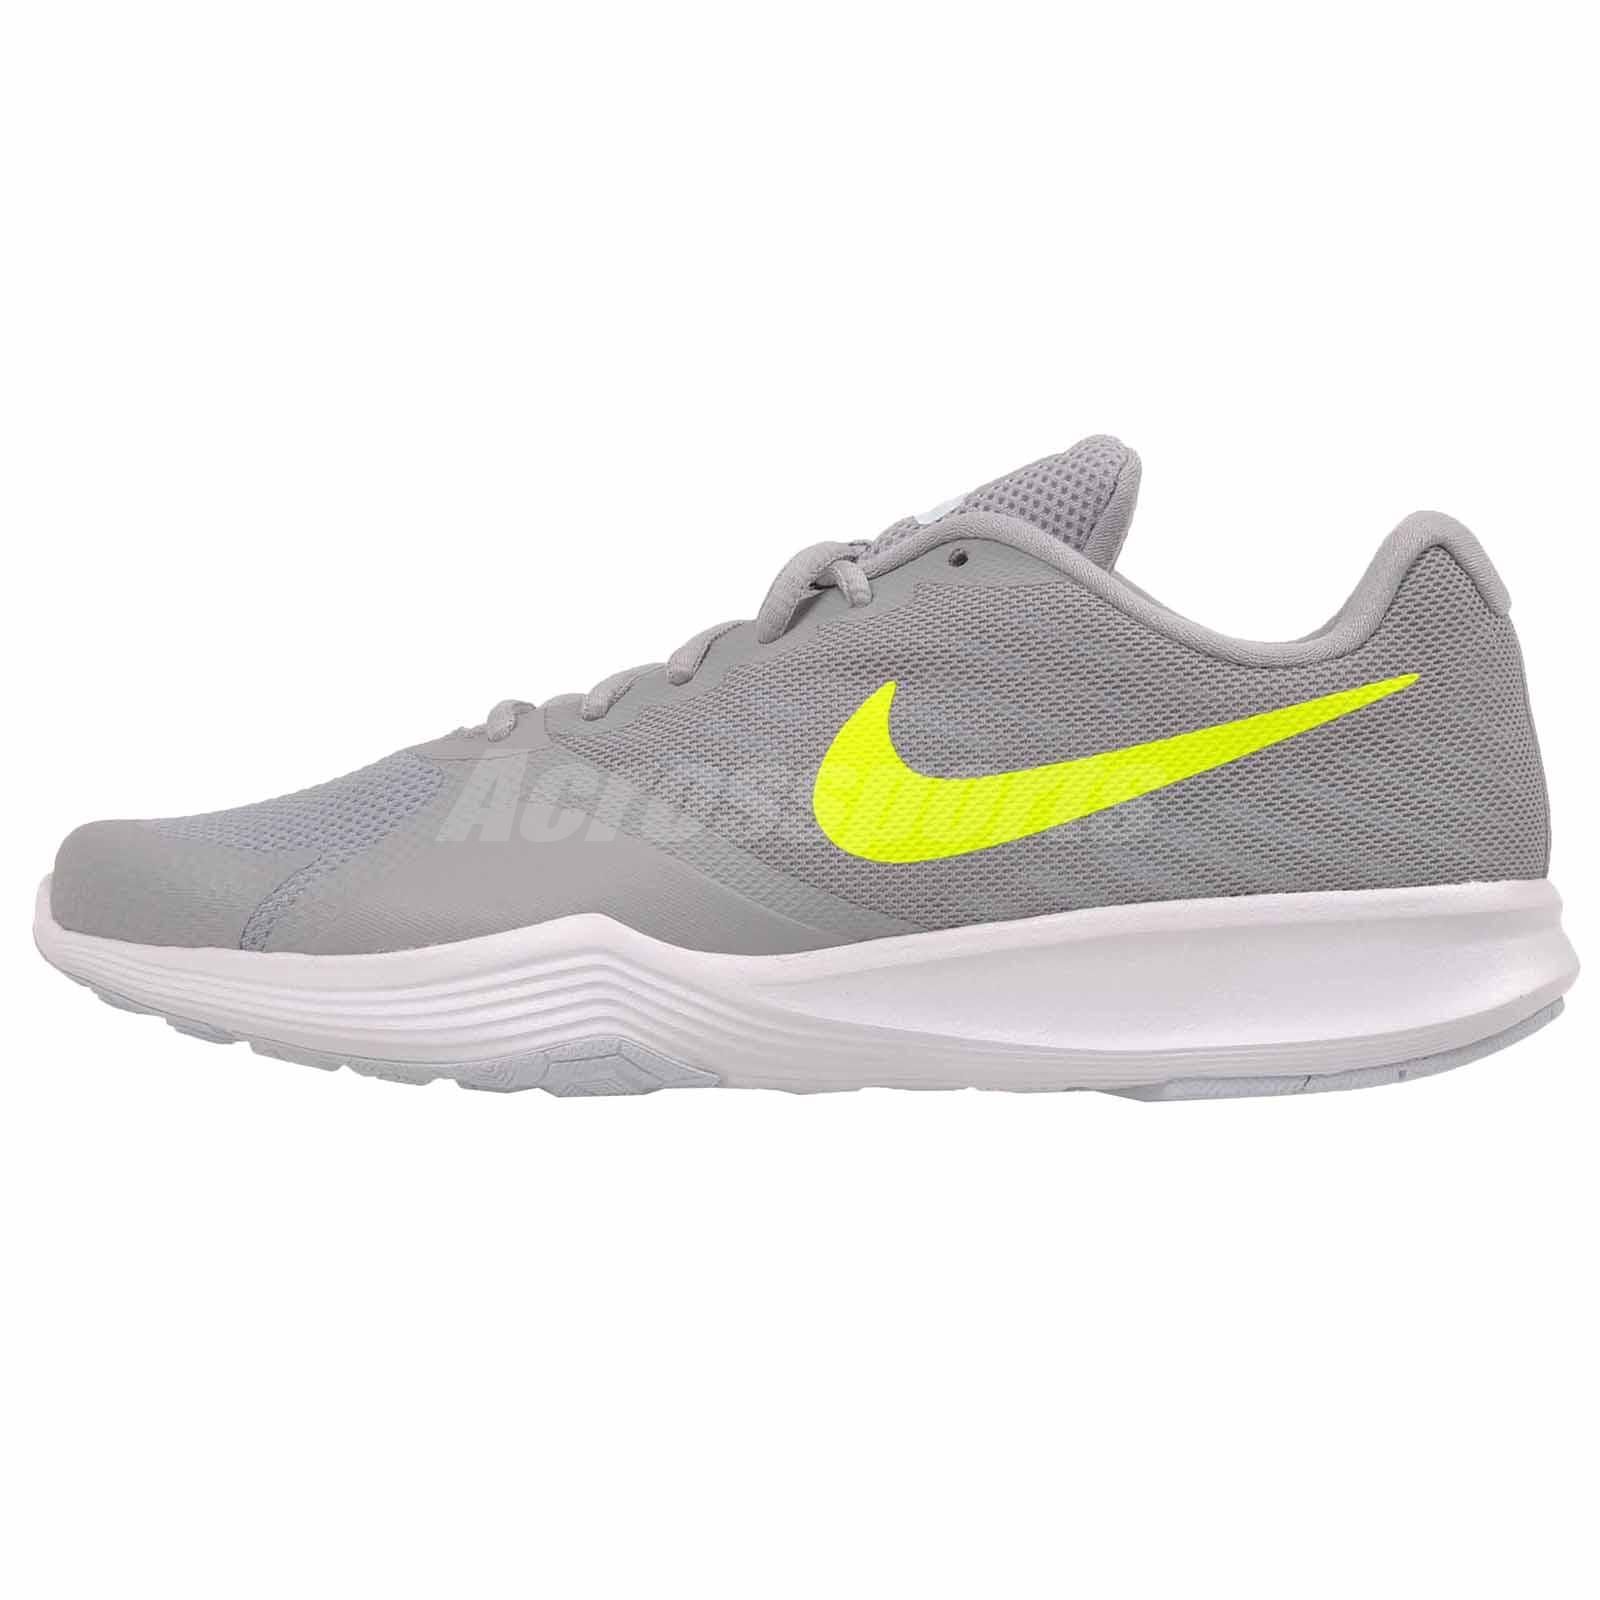 f2f8b202d58cb Nike Wmns City Trainer Cross Training Womens Shoes Grey Volt NWOB 909013-014